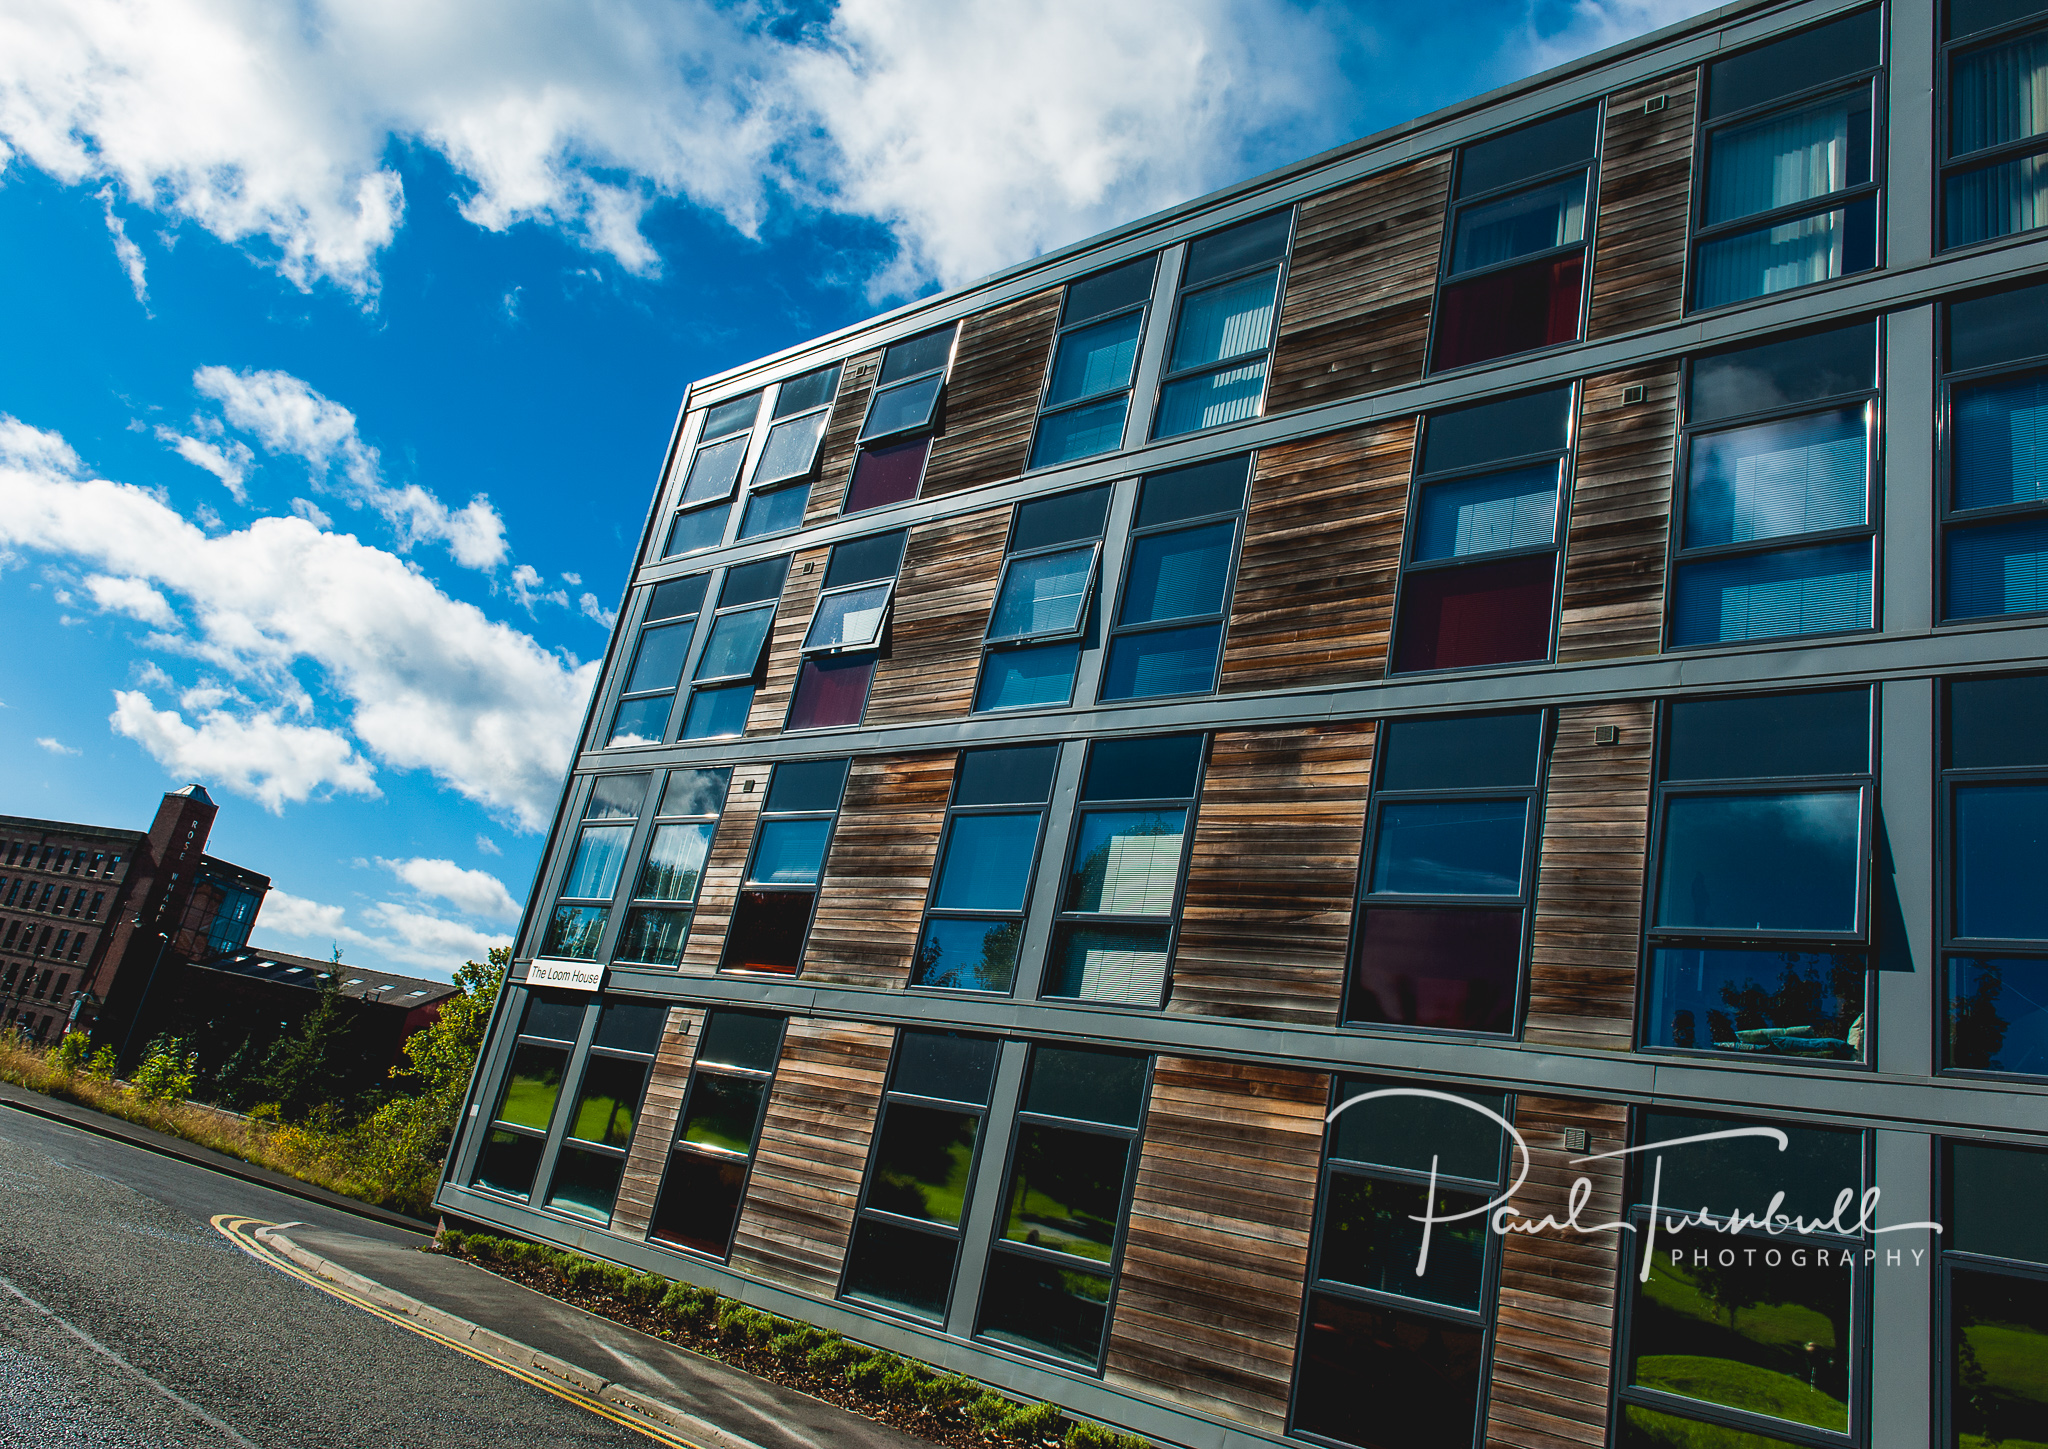 commercial-property-photographer-leeds-yorkshire-blackbrook-developments-001.jpg